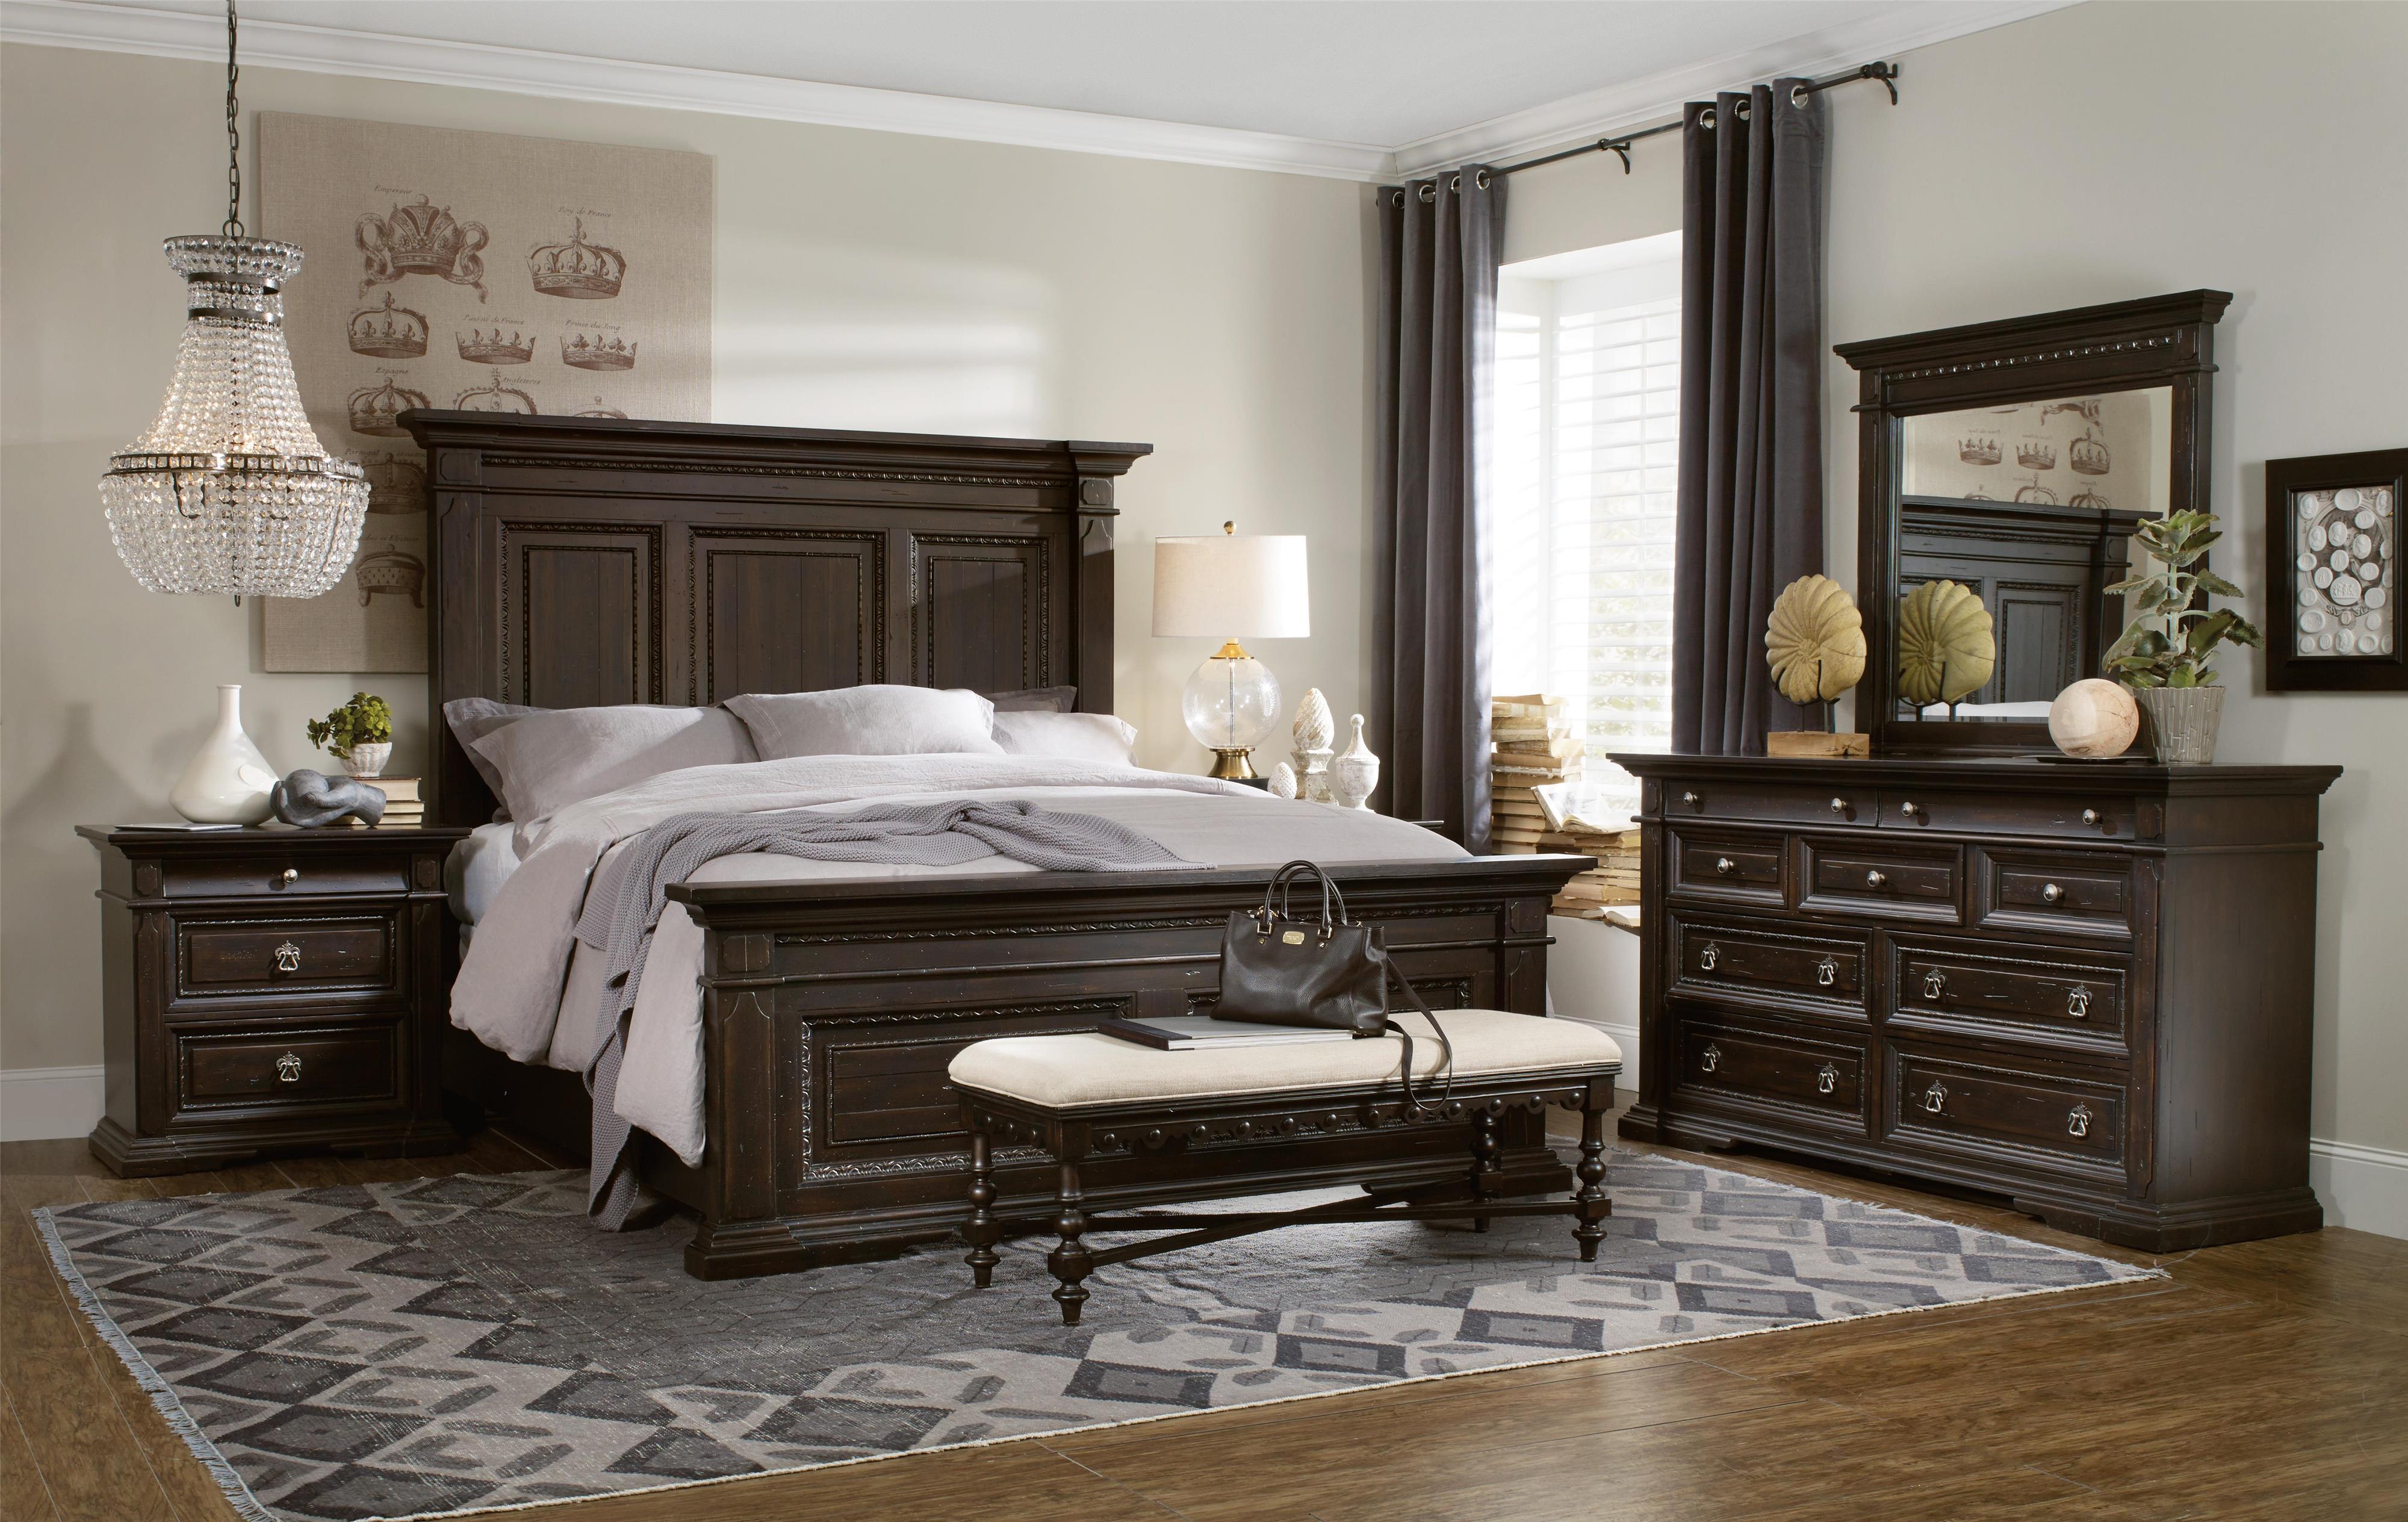 Treviso Queen Bedroom Group by Hooker Furniture at Baer's Furniture